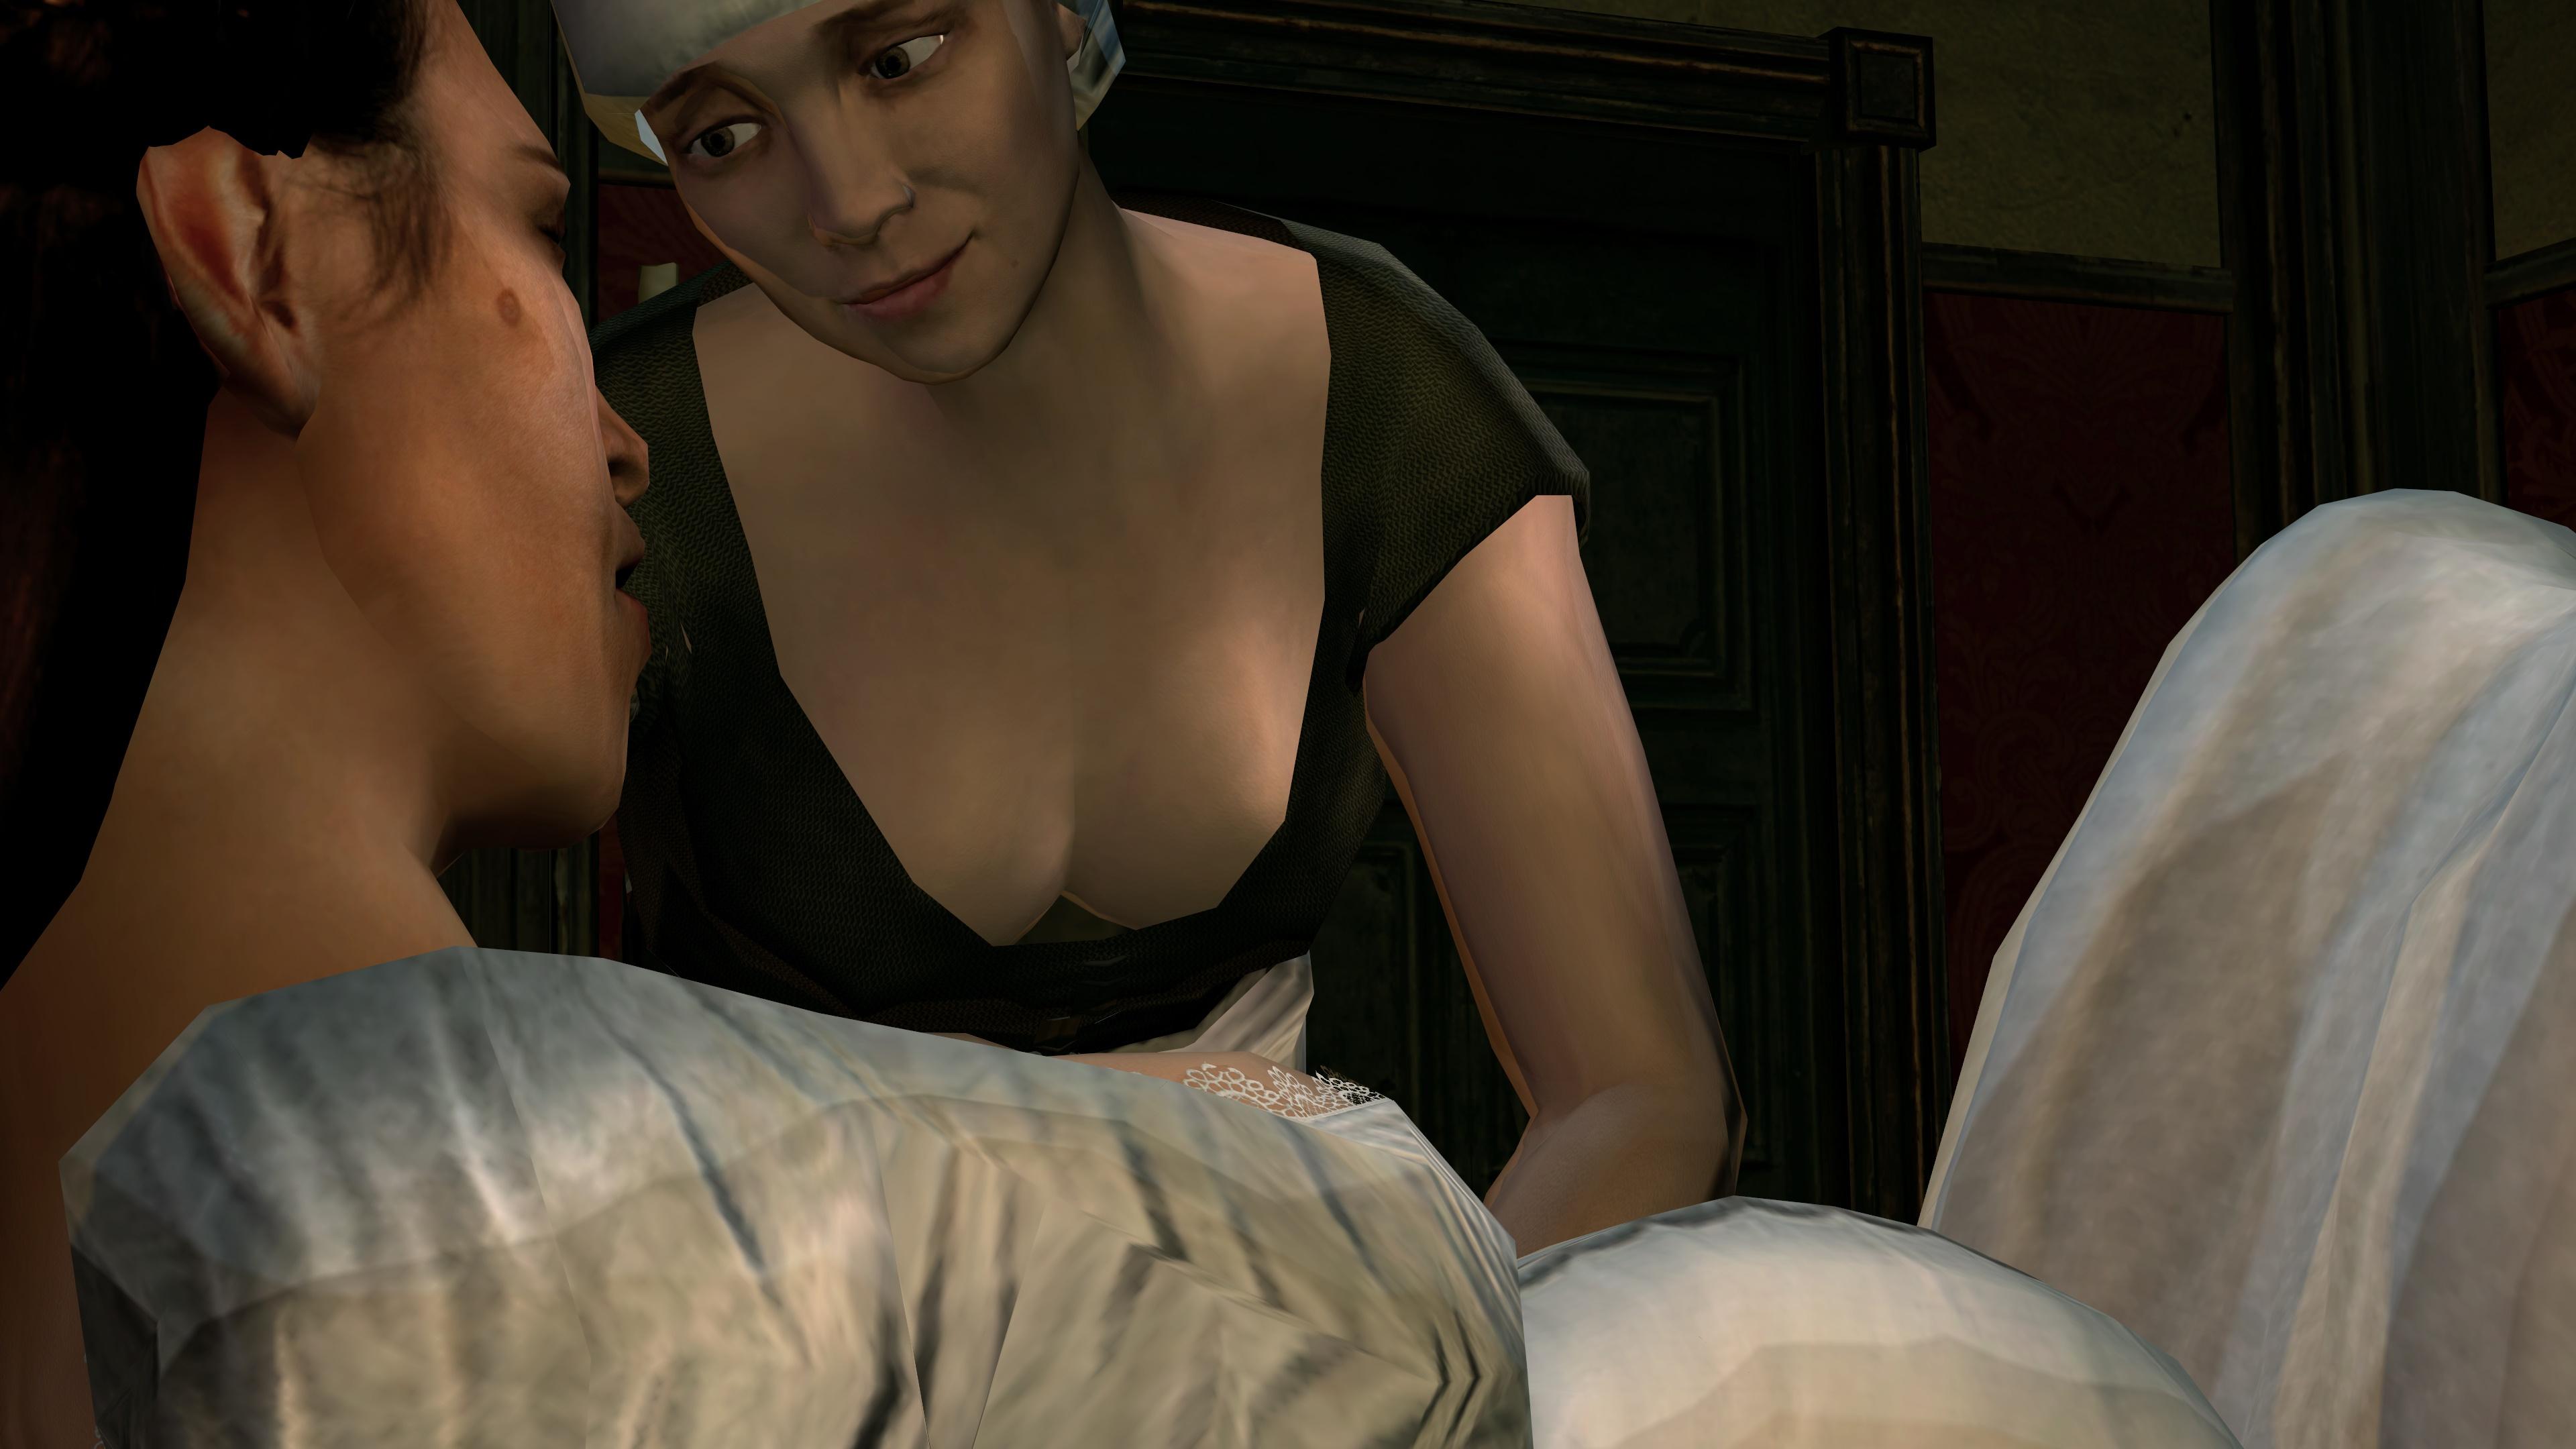 AssassinsCreedIIGame 2020-02-16 18-43-45-773.jpg - Assassin's Creed 2